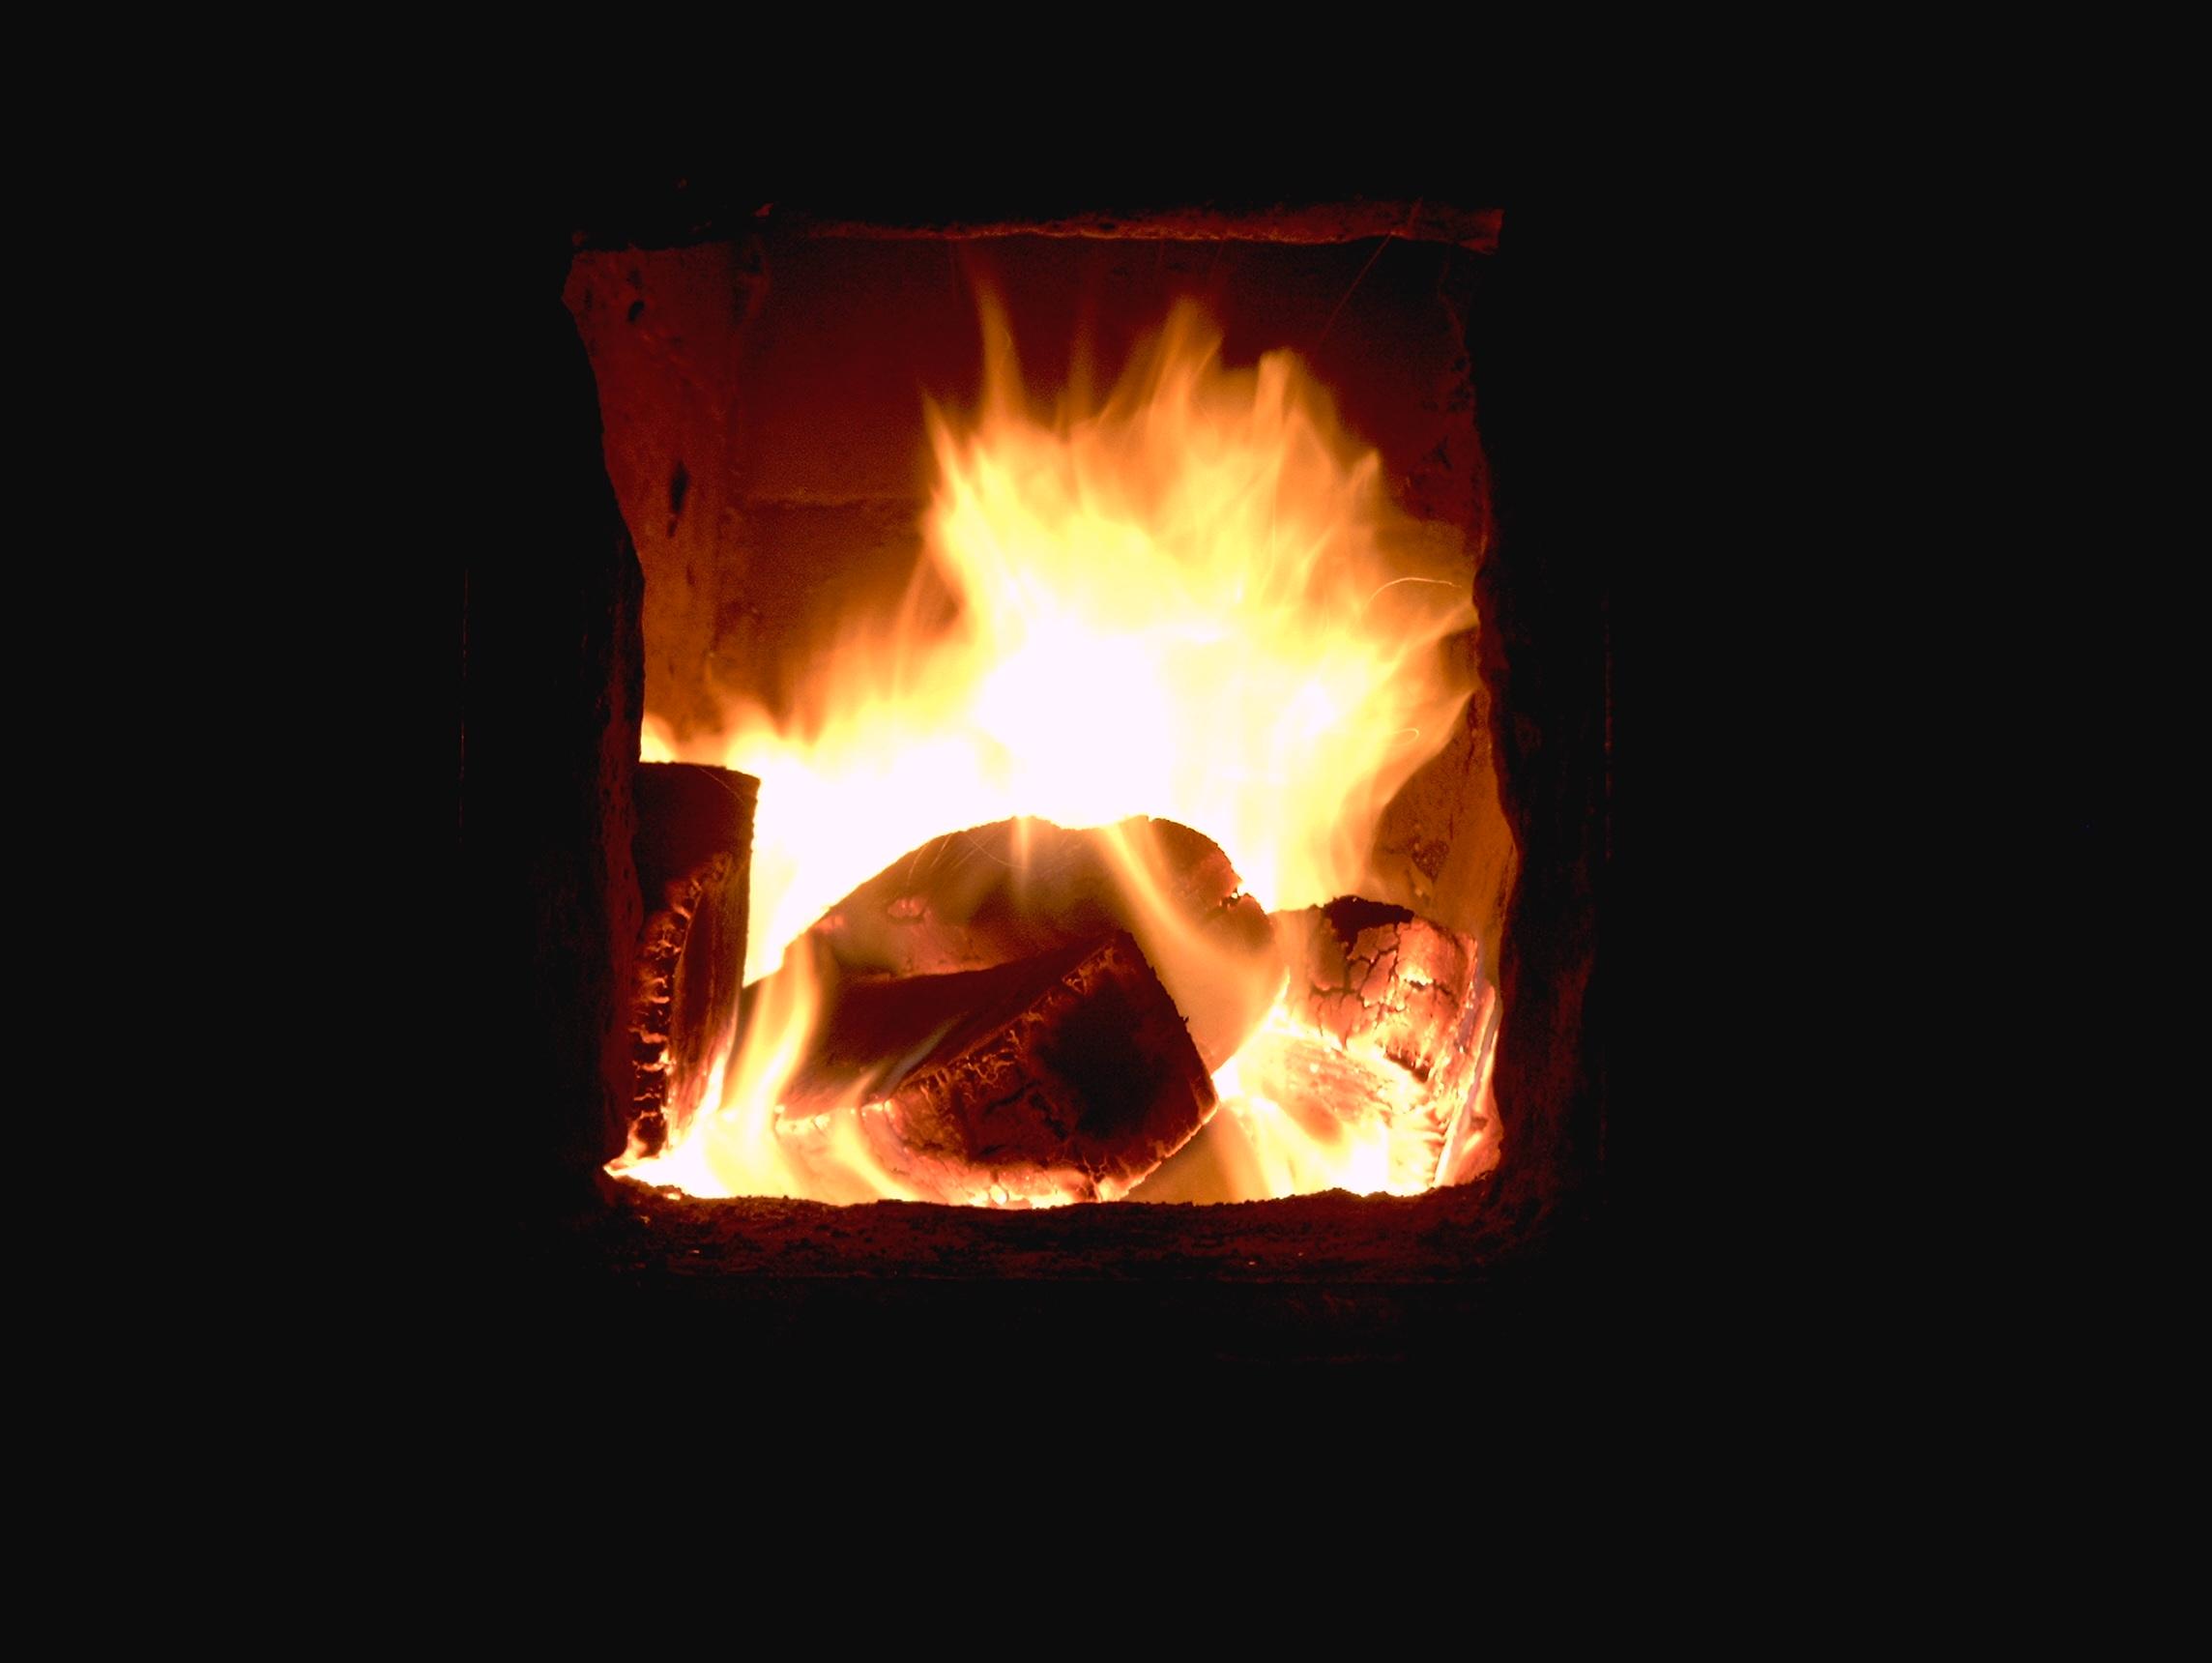 fire wikimedia commons